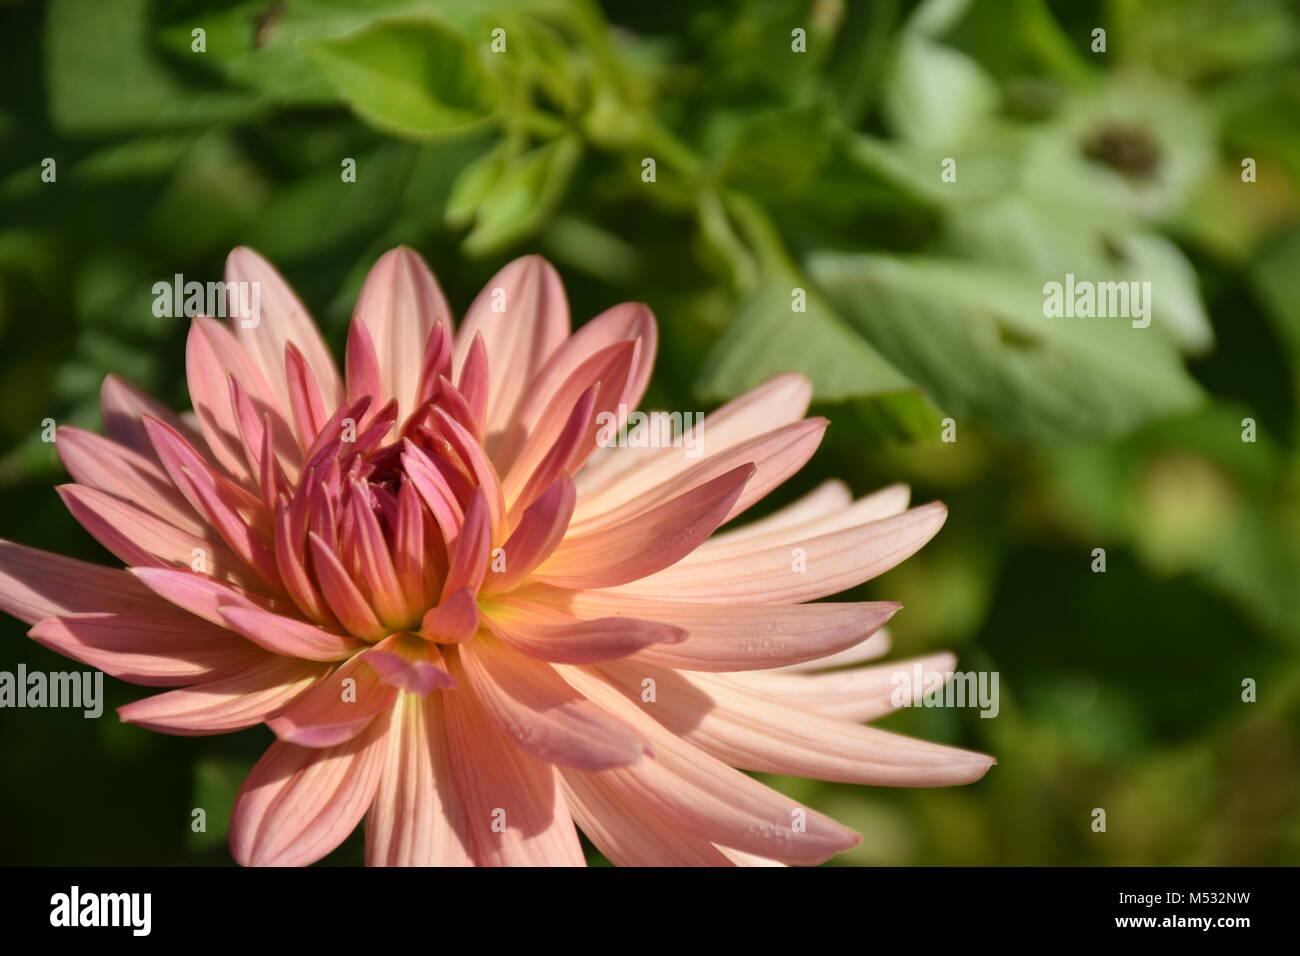 Beautiful Pink Dahlia (Georgina) Flower in the Garden on a Sunny Day. Stock Photo. Stock Photo